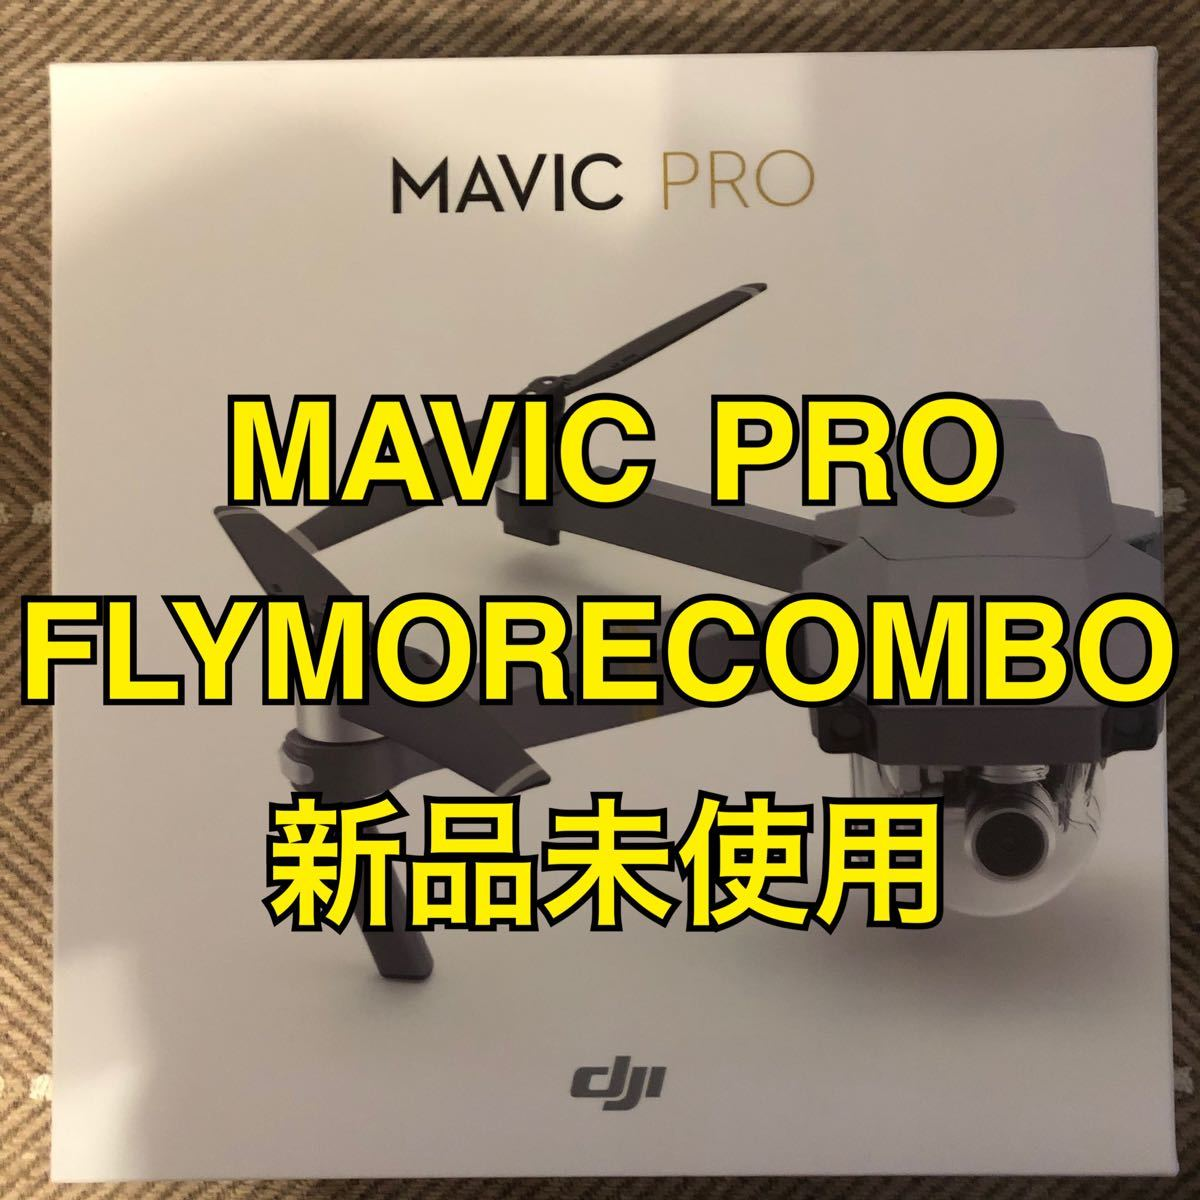 mavic pro flymore combo 未使用